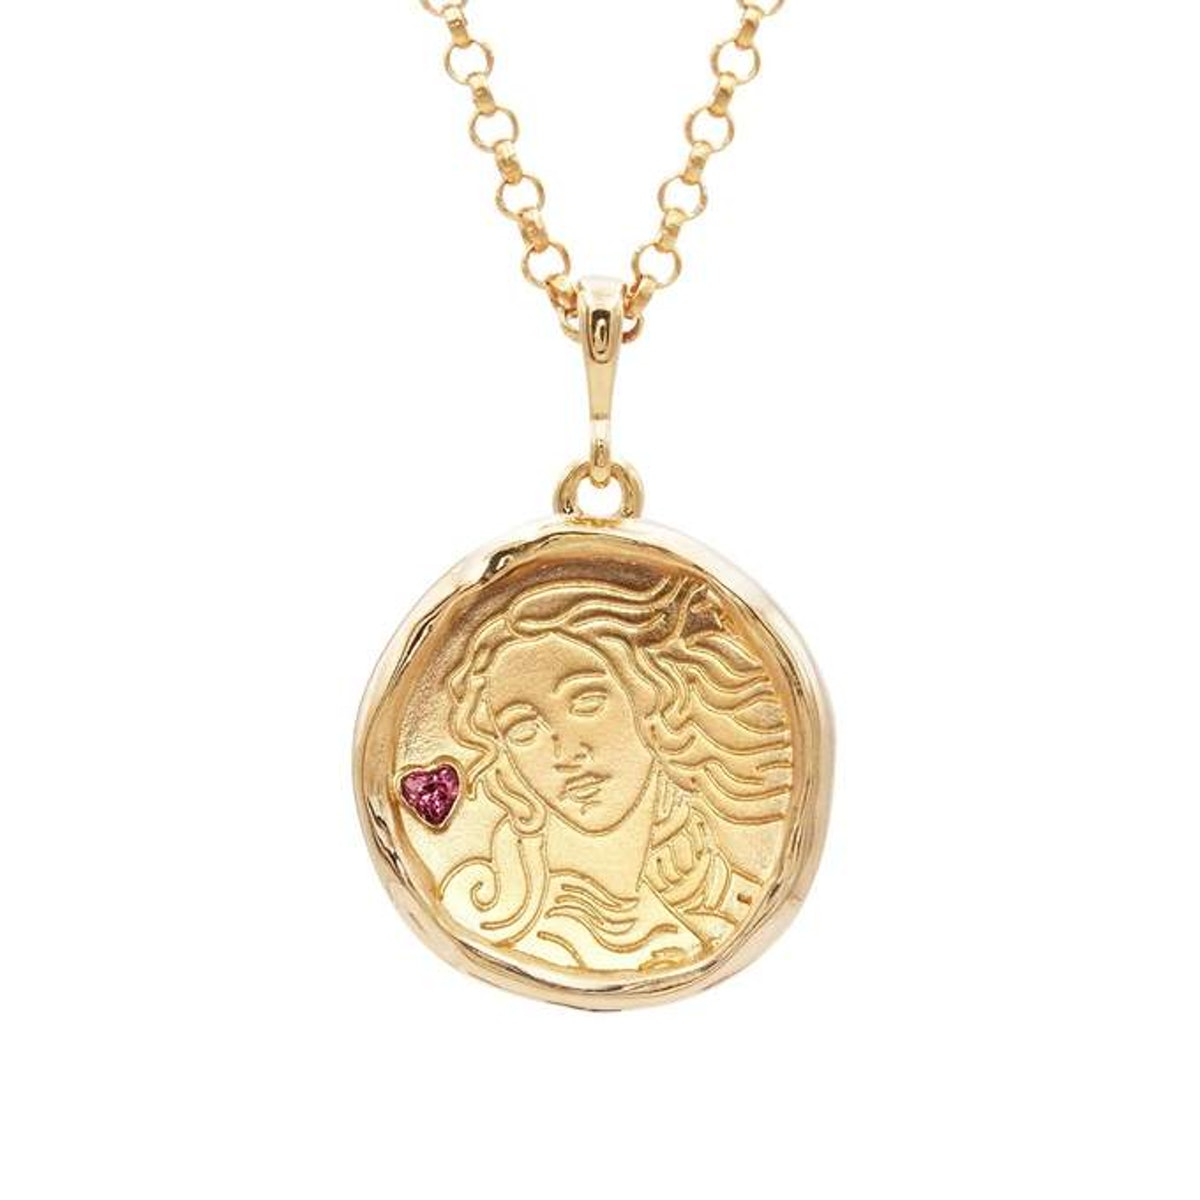 Aphrodite Gold and Garnet Medallion Necklace